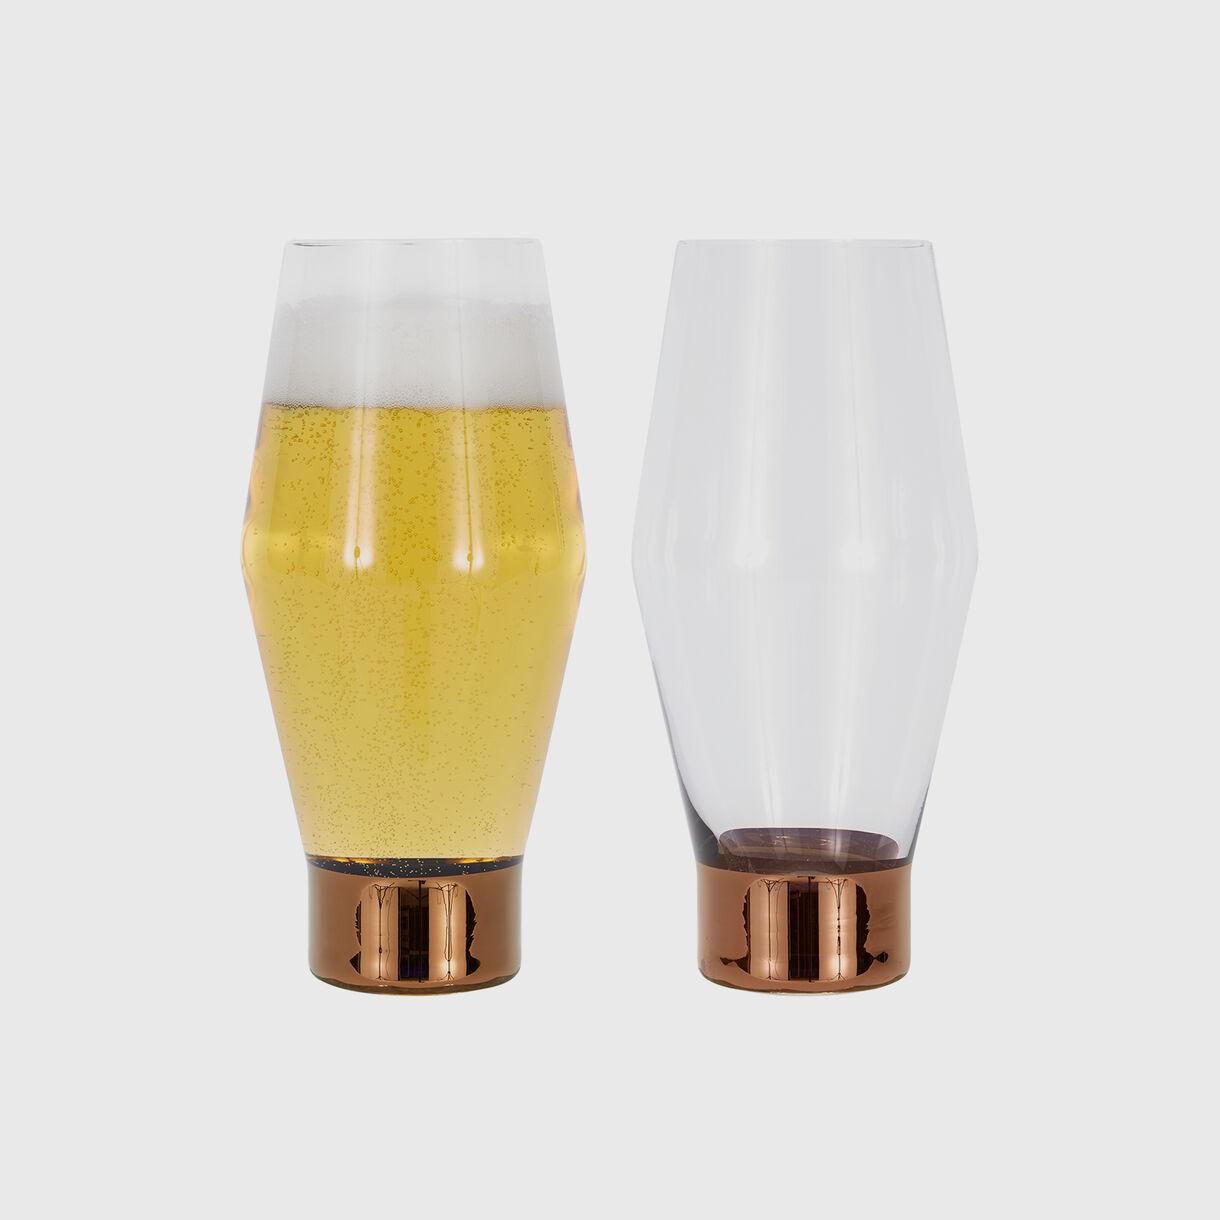 Tank Beer Glasses, Copper